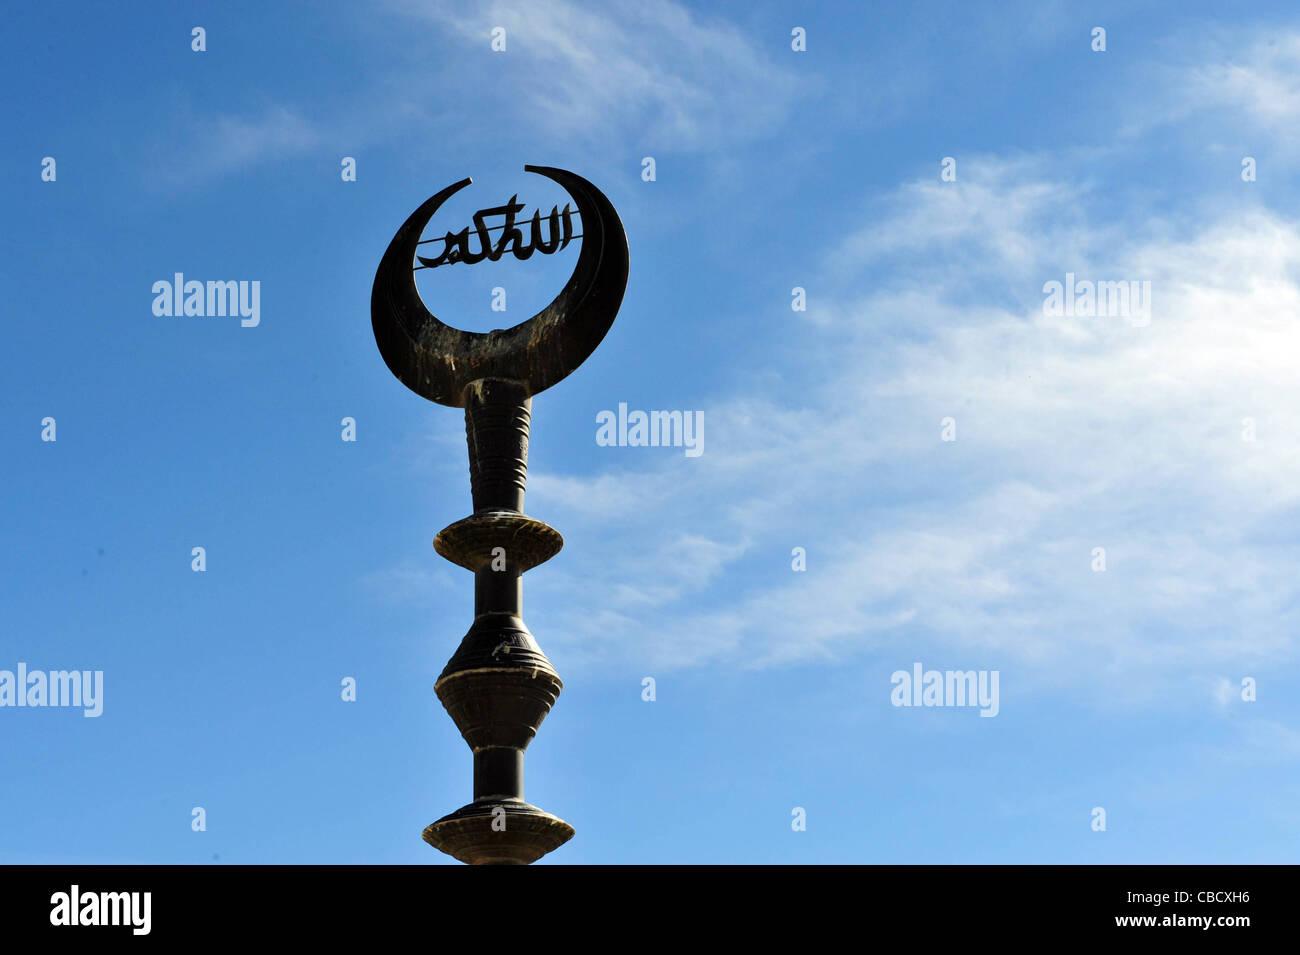 Islam Symbol Crescent Moon On Stock Photos Islam Symbol Crescent